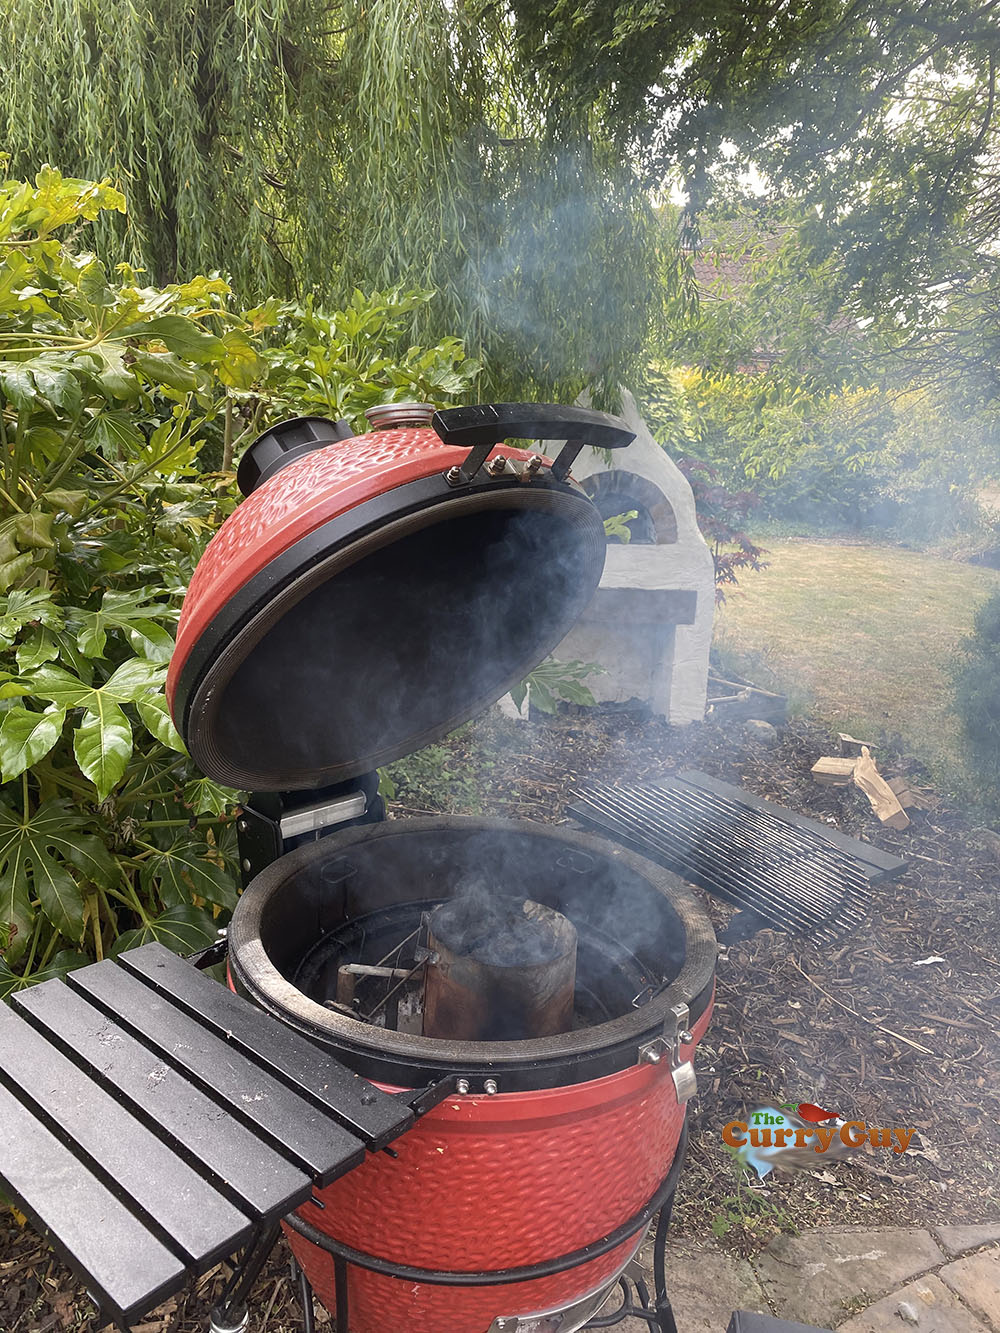 Setting up BBQ